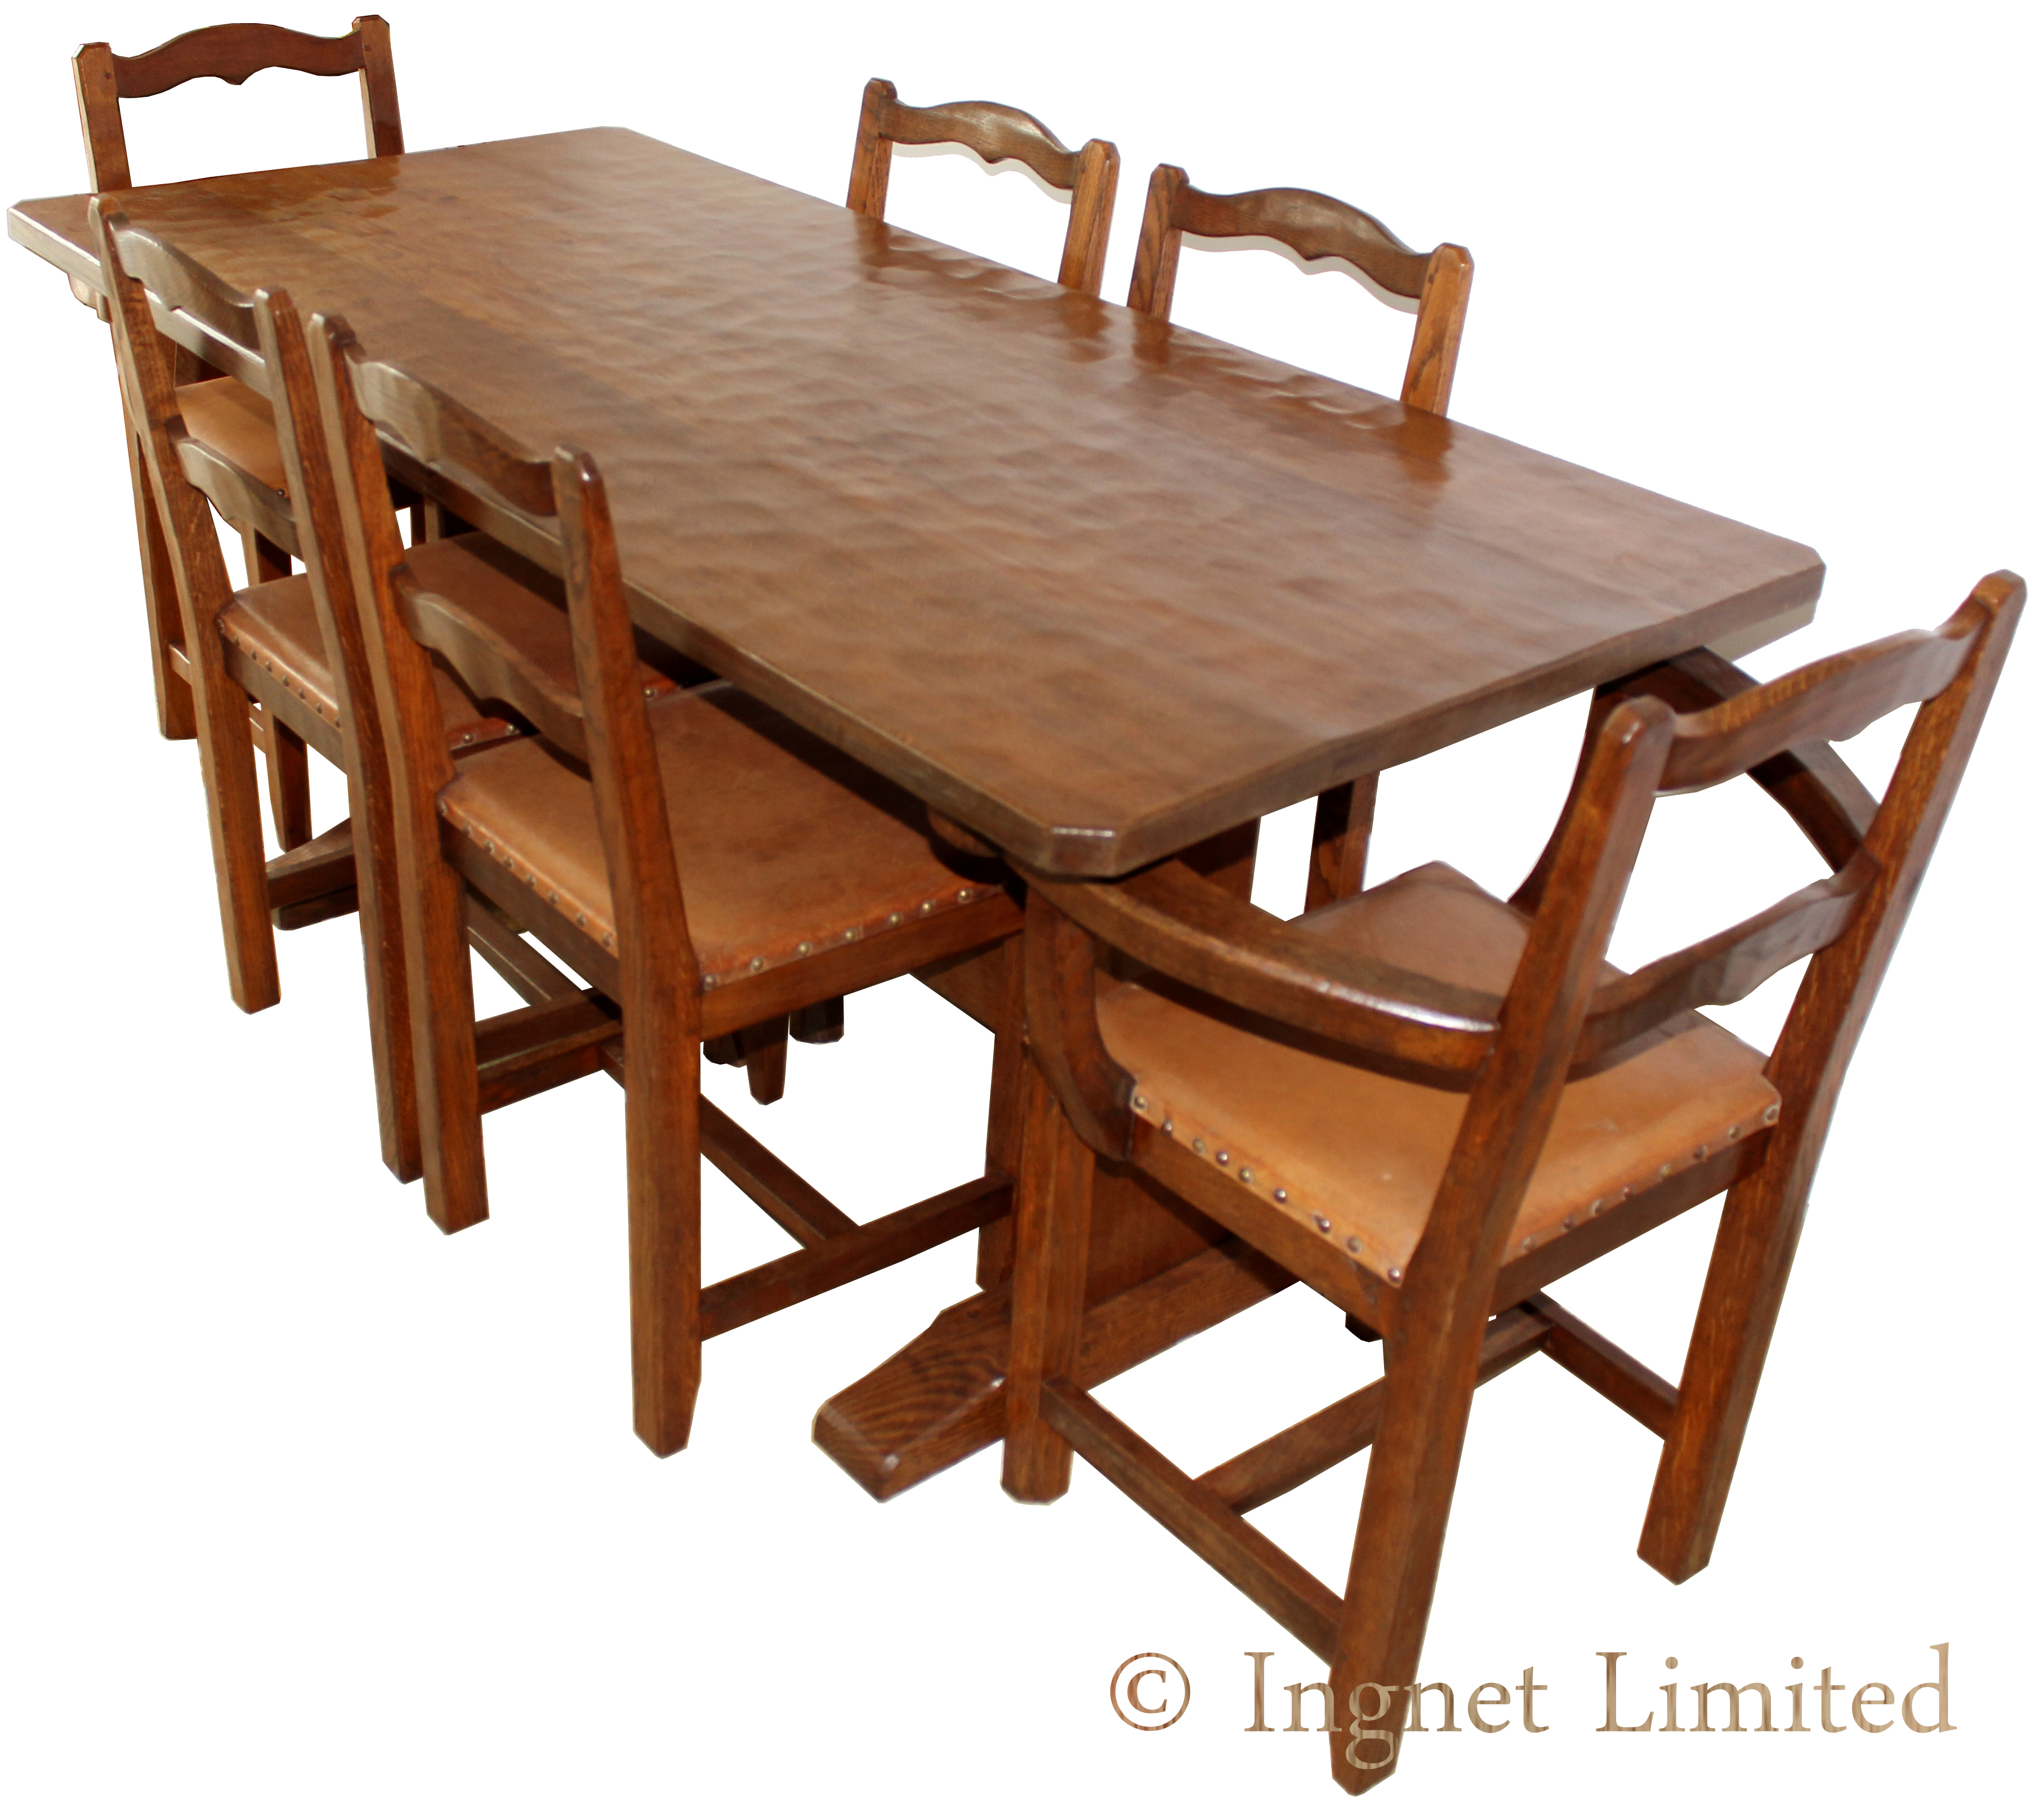 King post yorkshire oak adzed dining suite ingnet